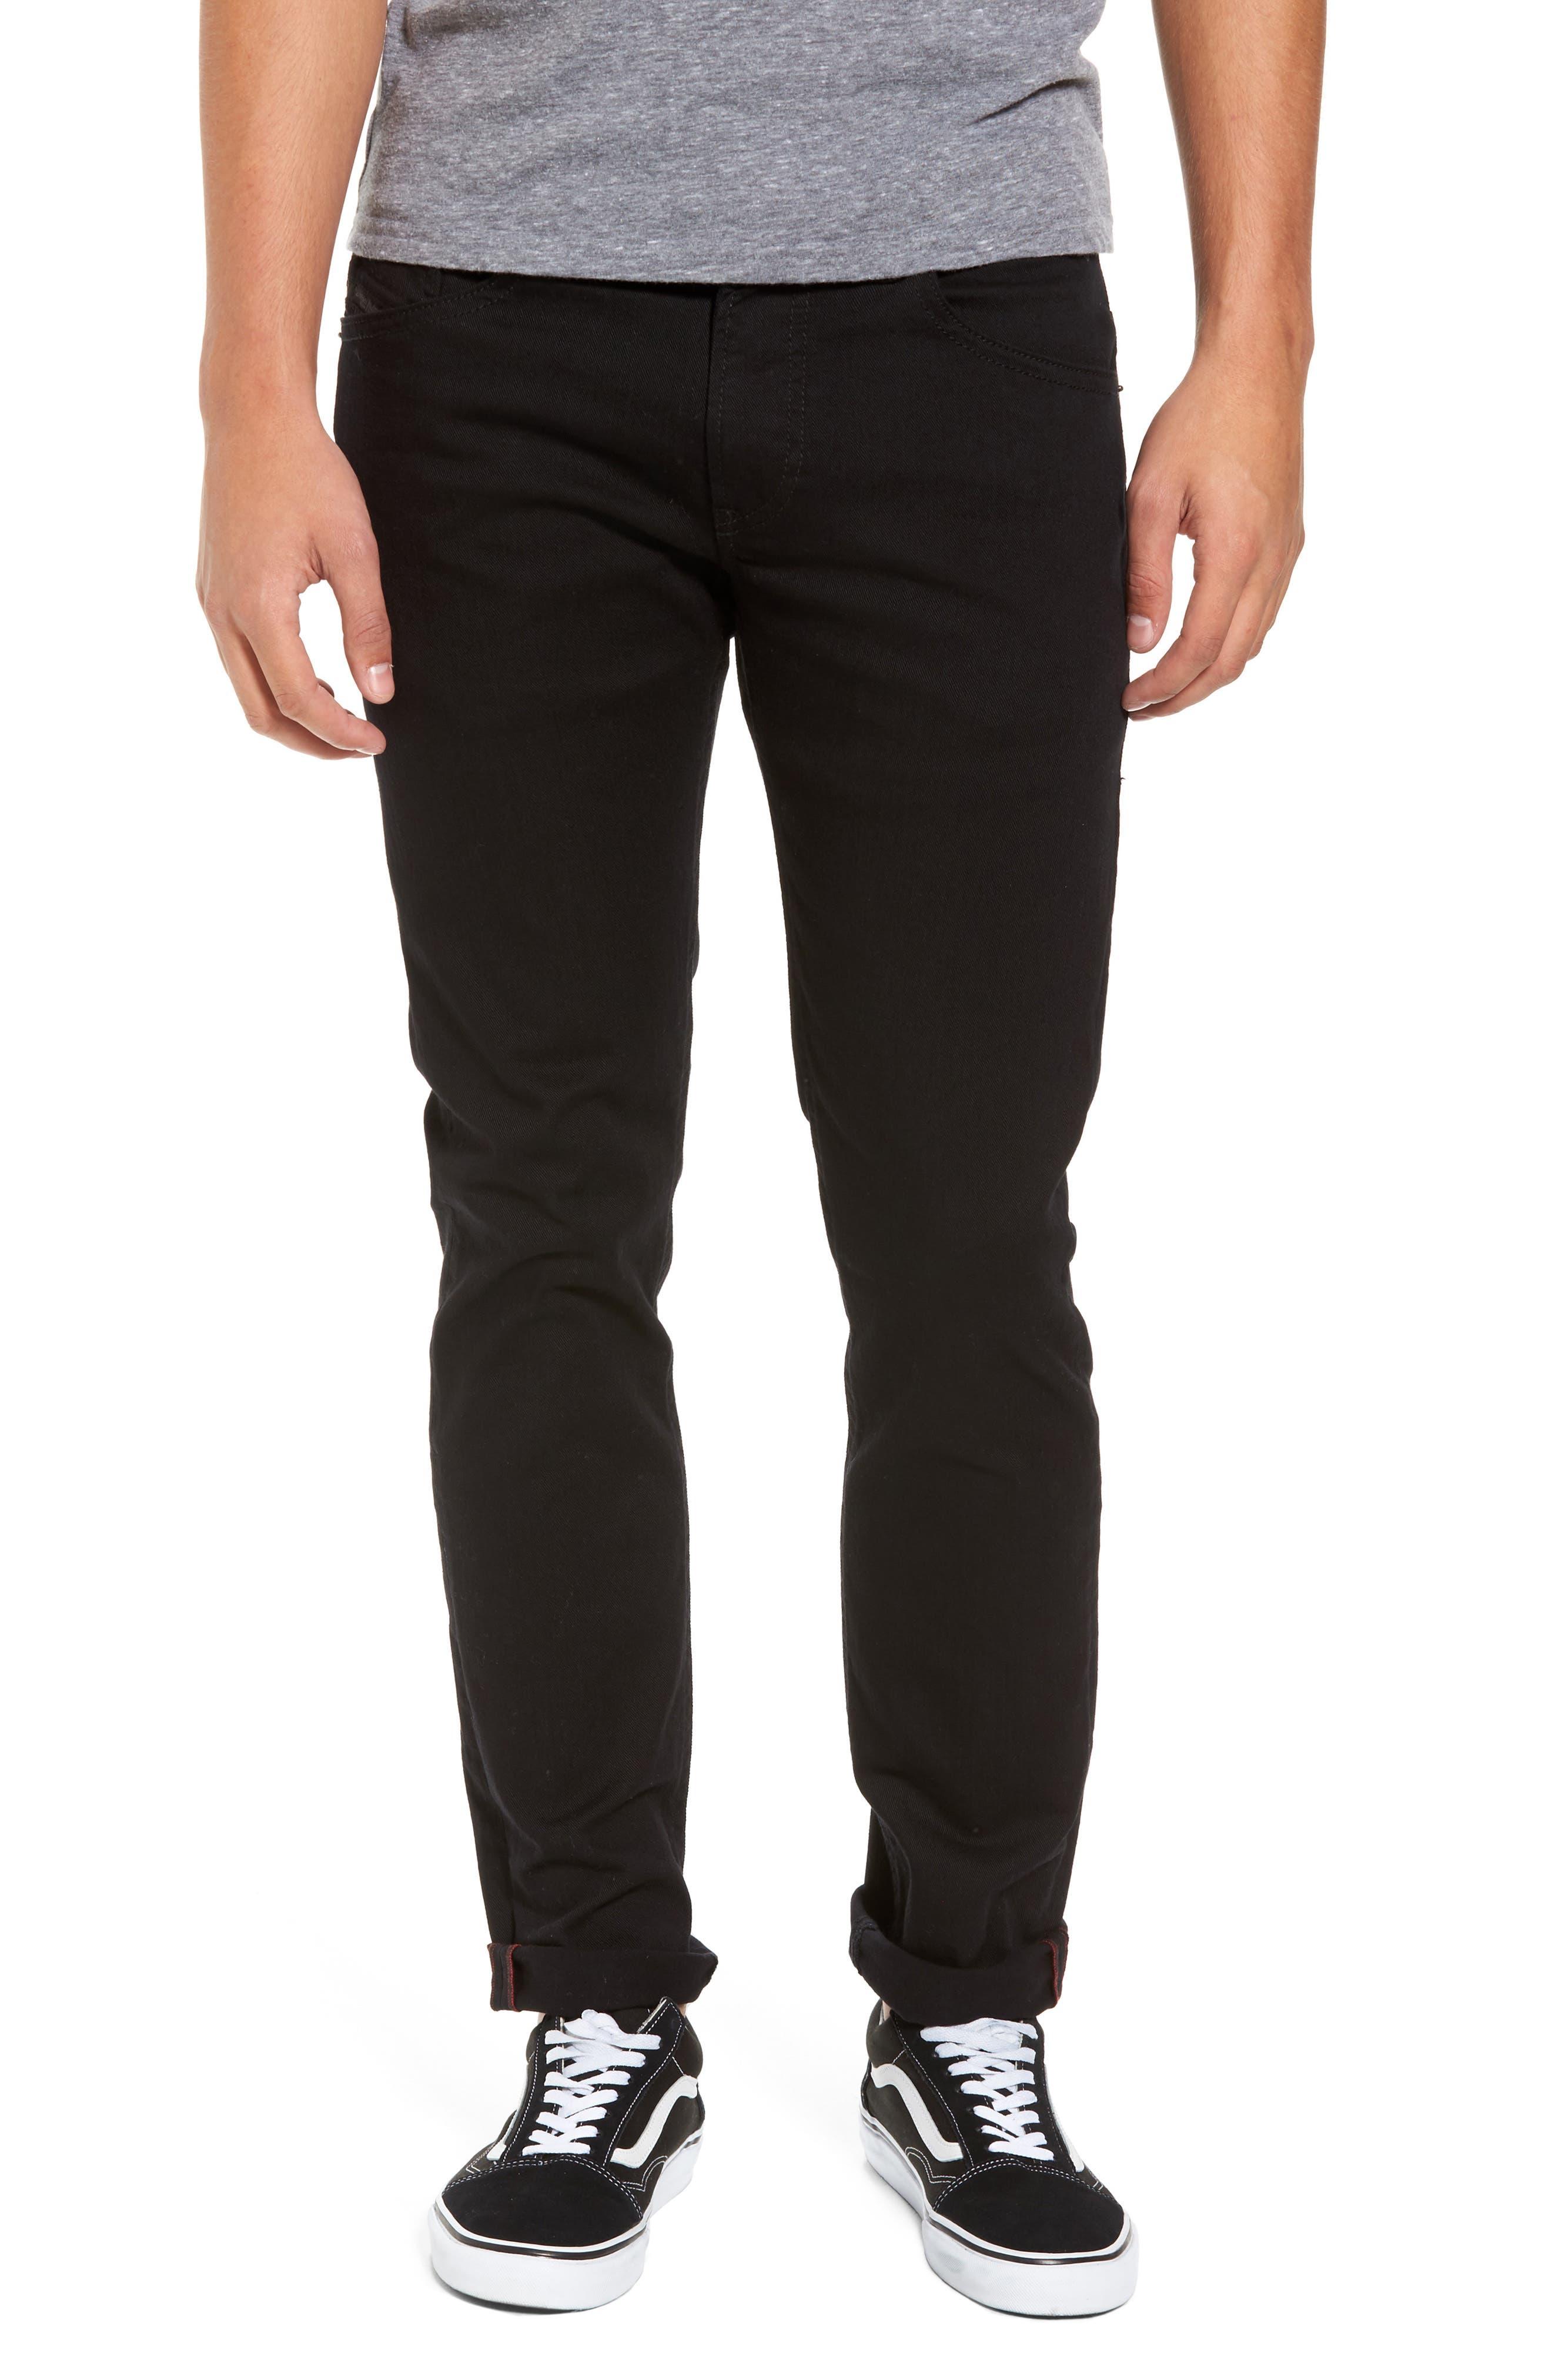 Thommer Slim Fit Jeans,                             Main thumbnail 1, color,                             Black/ Denim